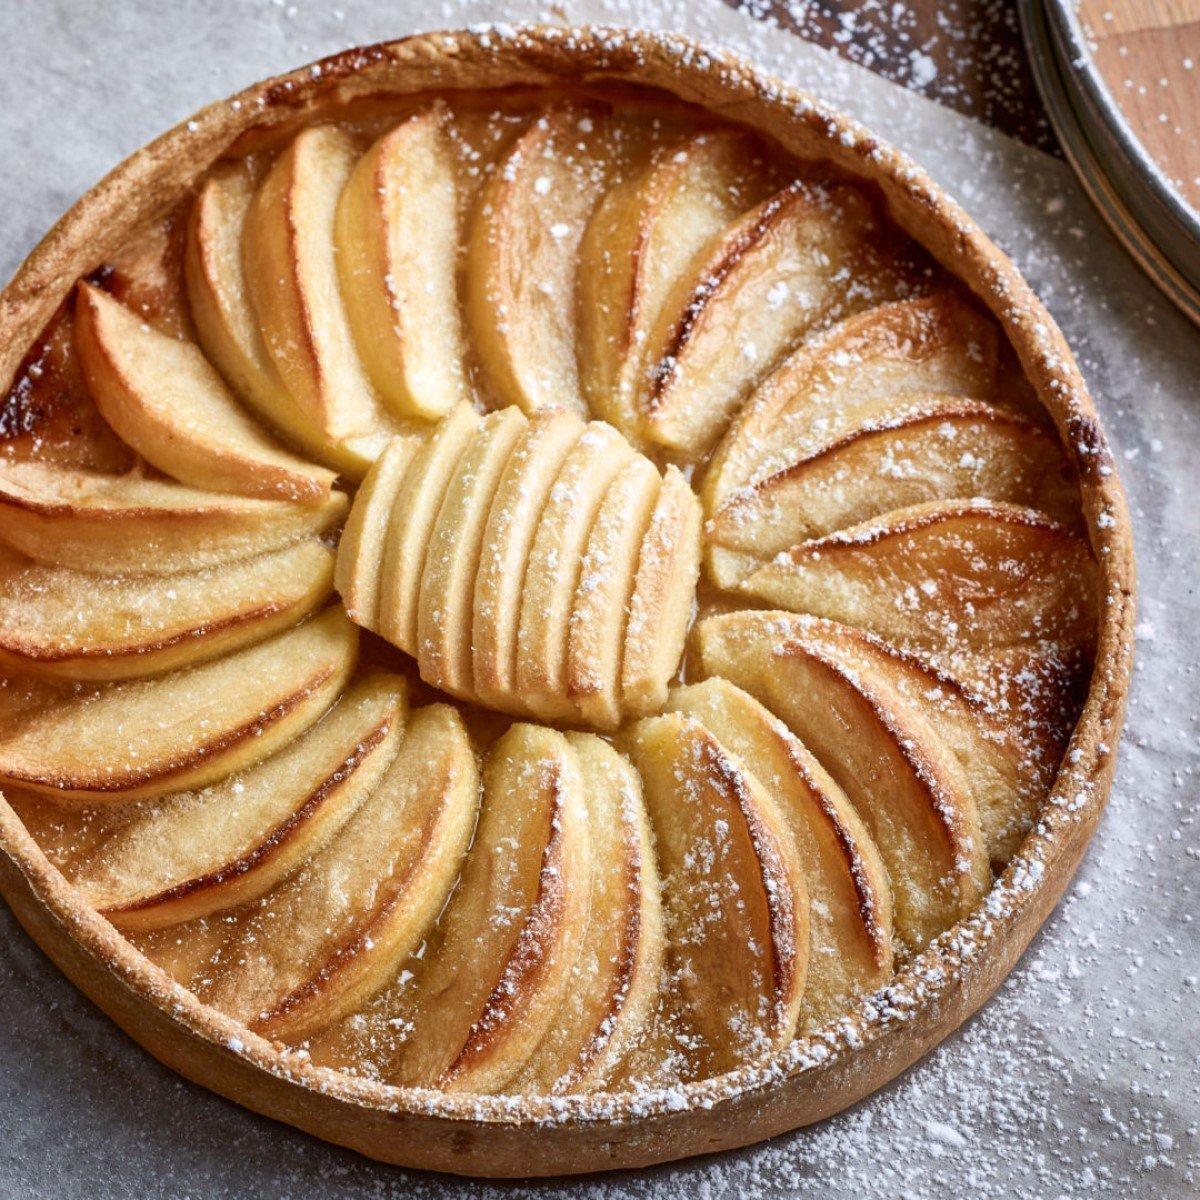 Raymond Blanc's Apple Tart 'Maman Blanc' Recipe